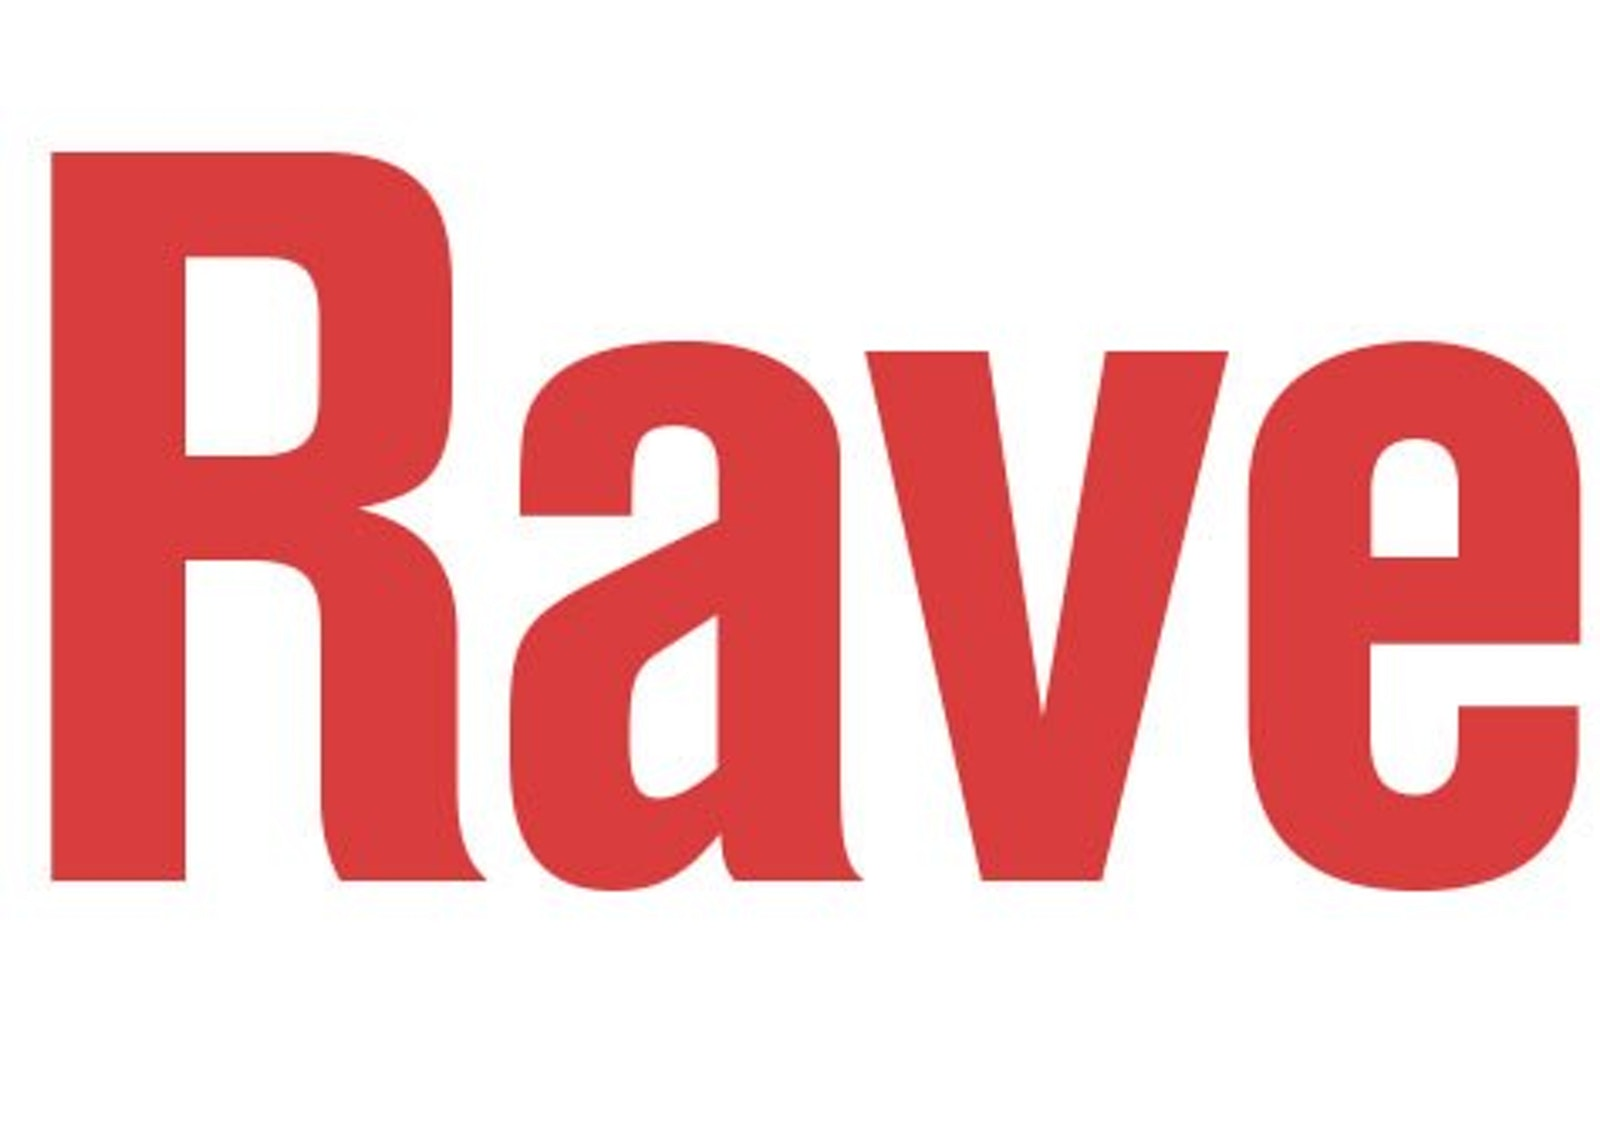 Rave name